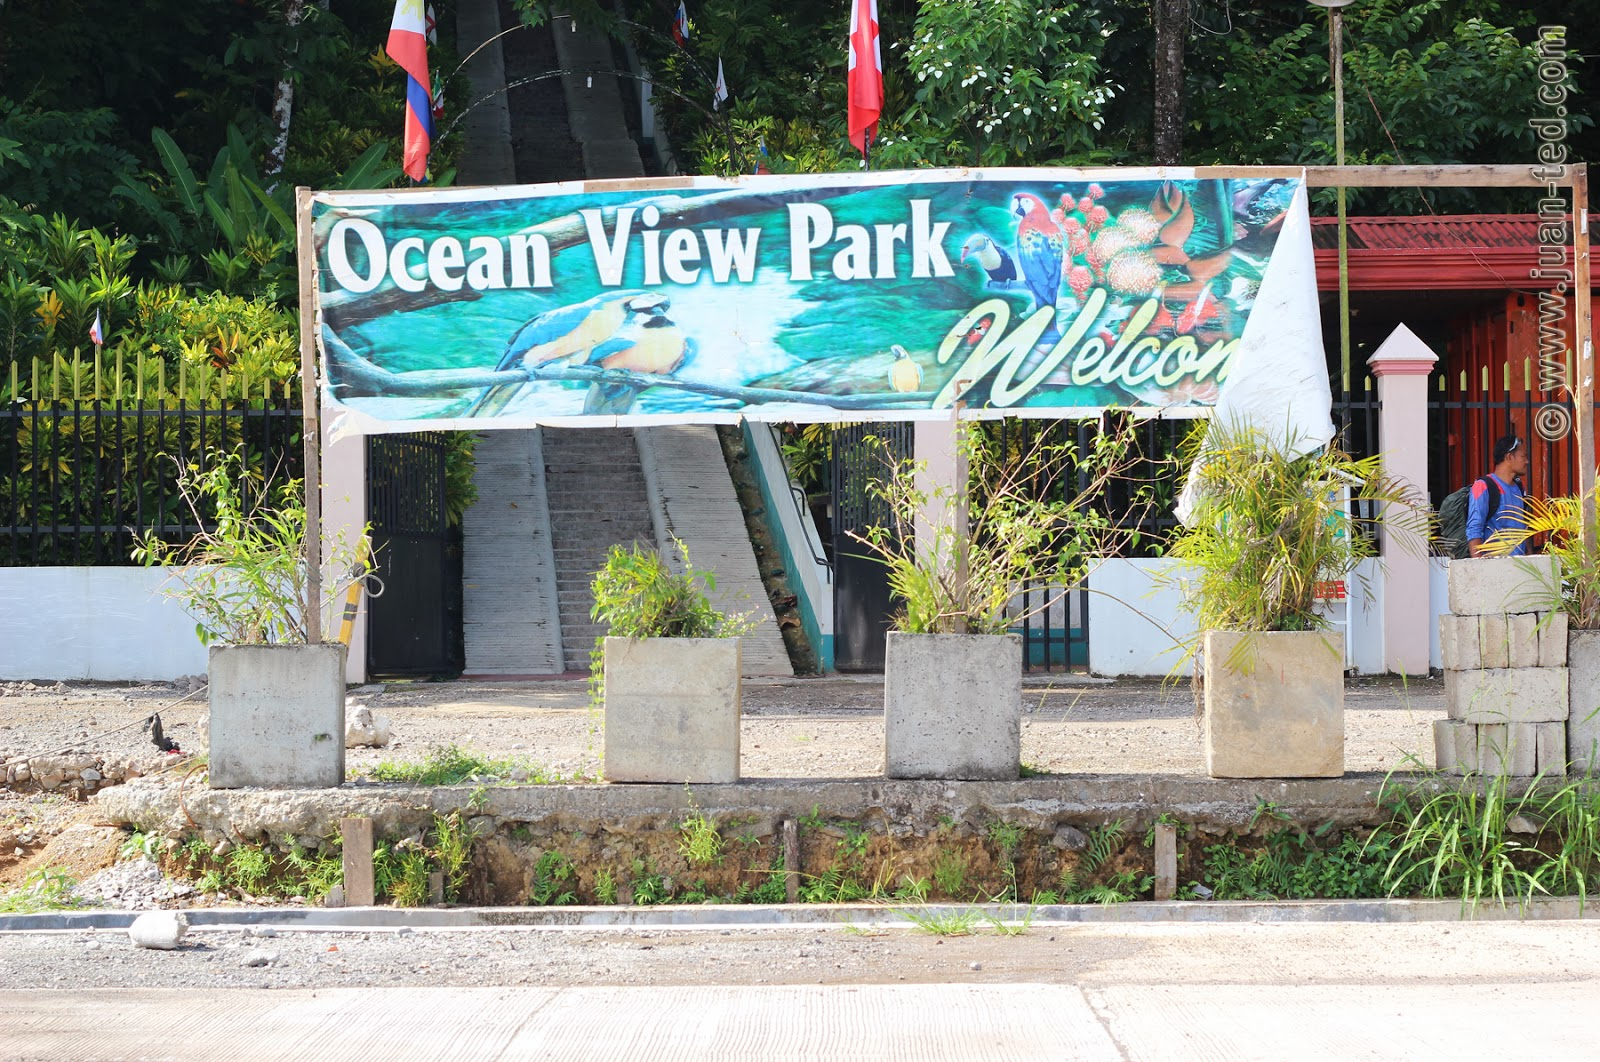 Ocean View Park International Doll House Entrance Bislig City